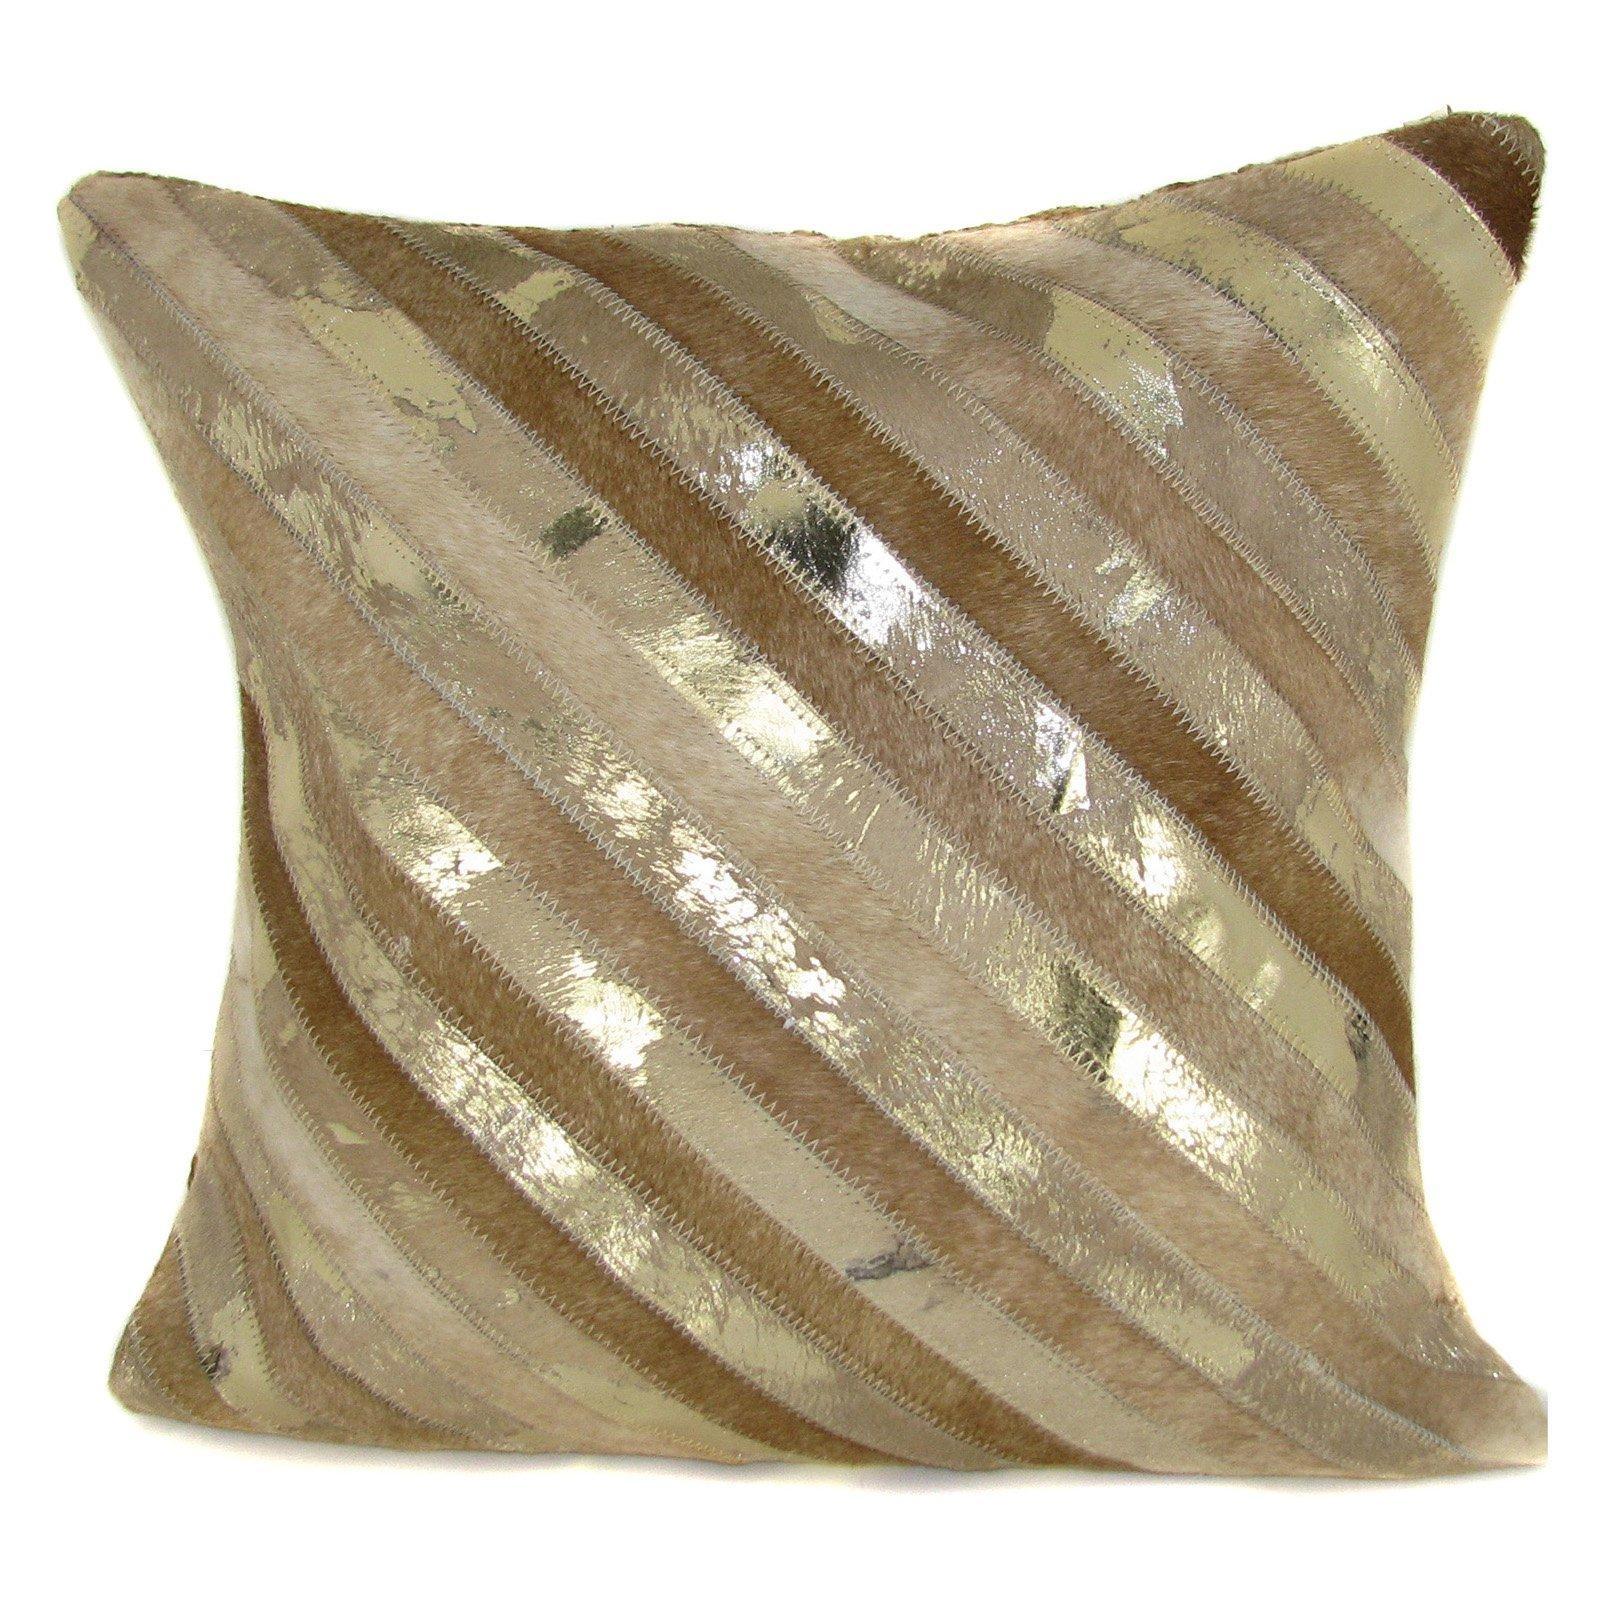 Decorative Gold Throw Pillows | Home Designjohn Regarding Gold Sofa Pillows (View 14 of 20)